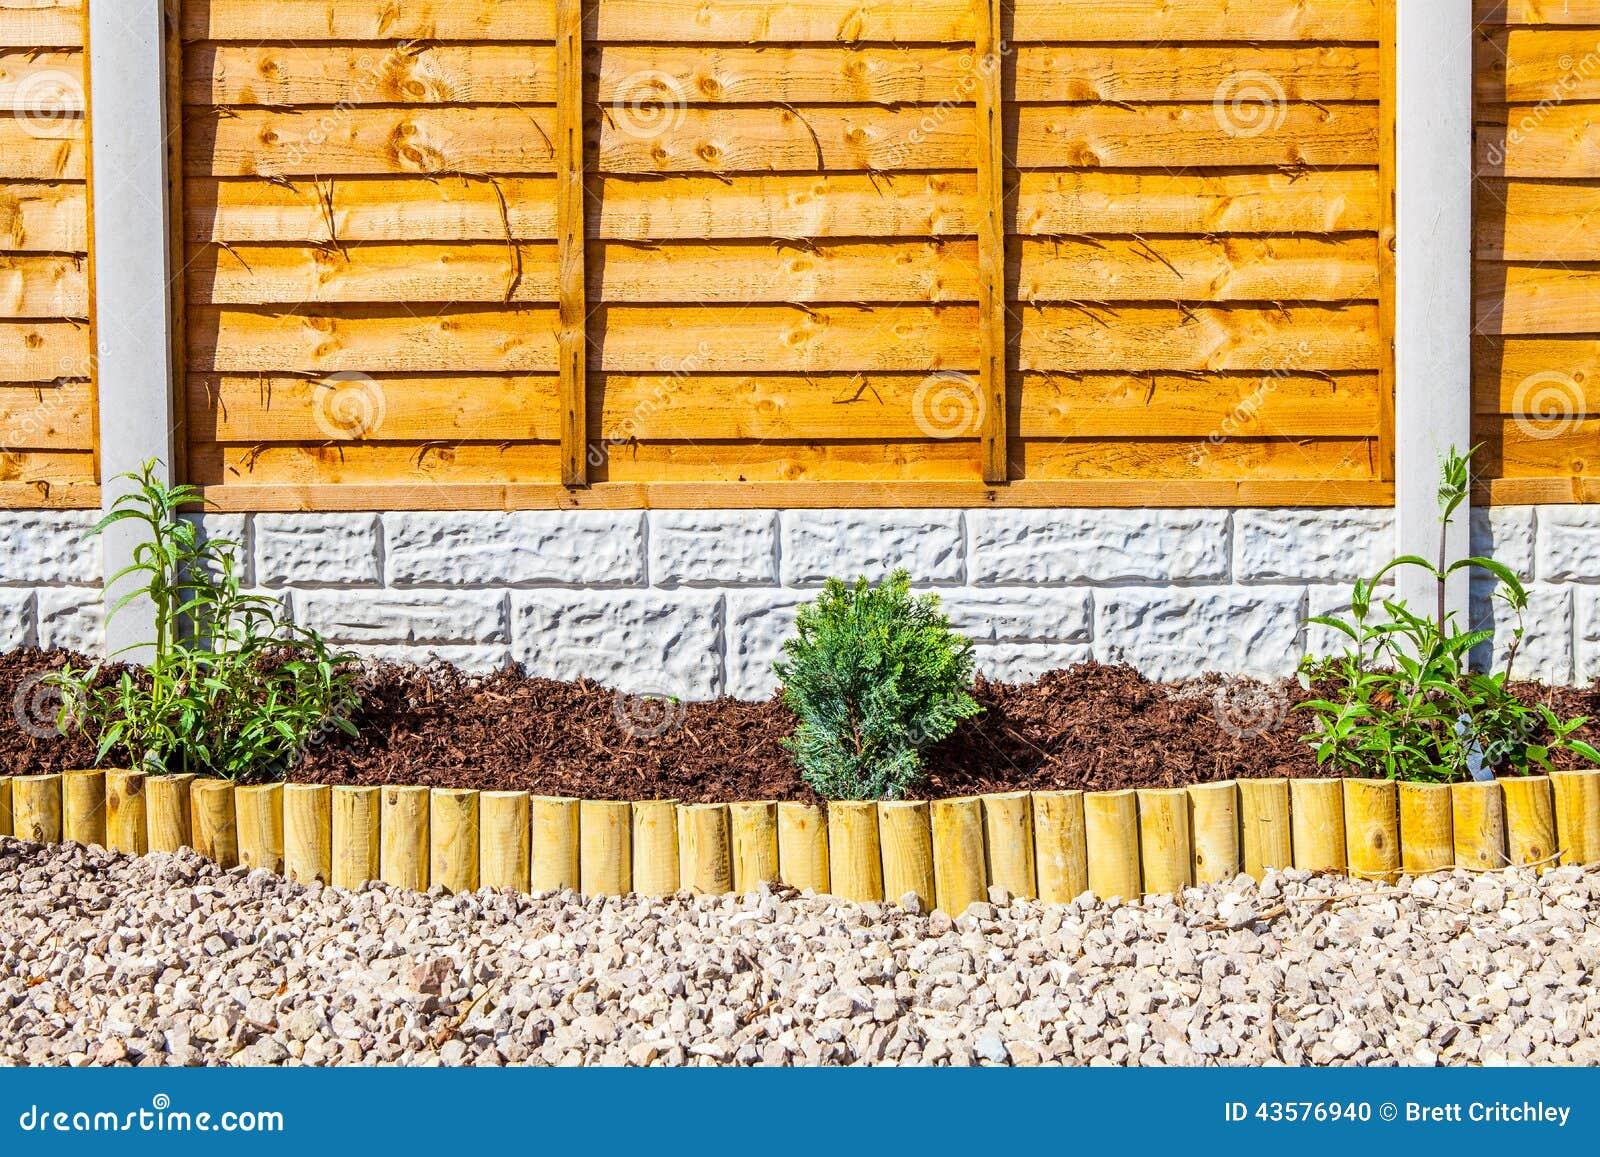 New Landscaped Wood Chip Garden Border Stock Photo Image